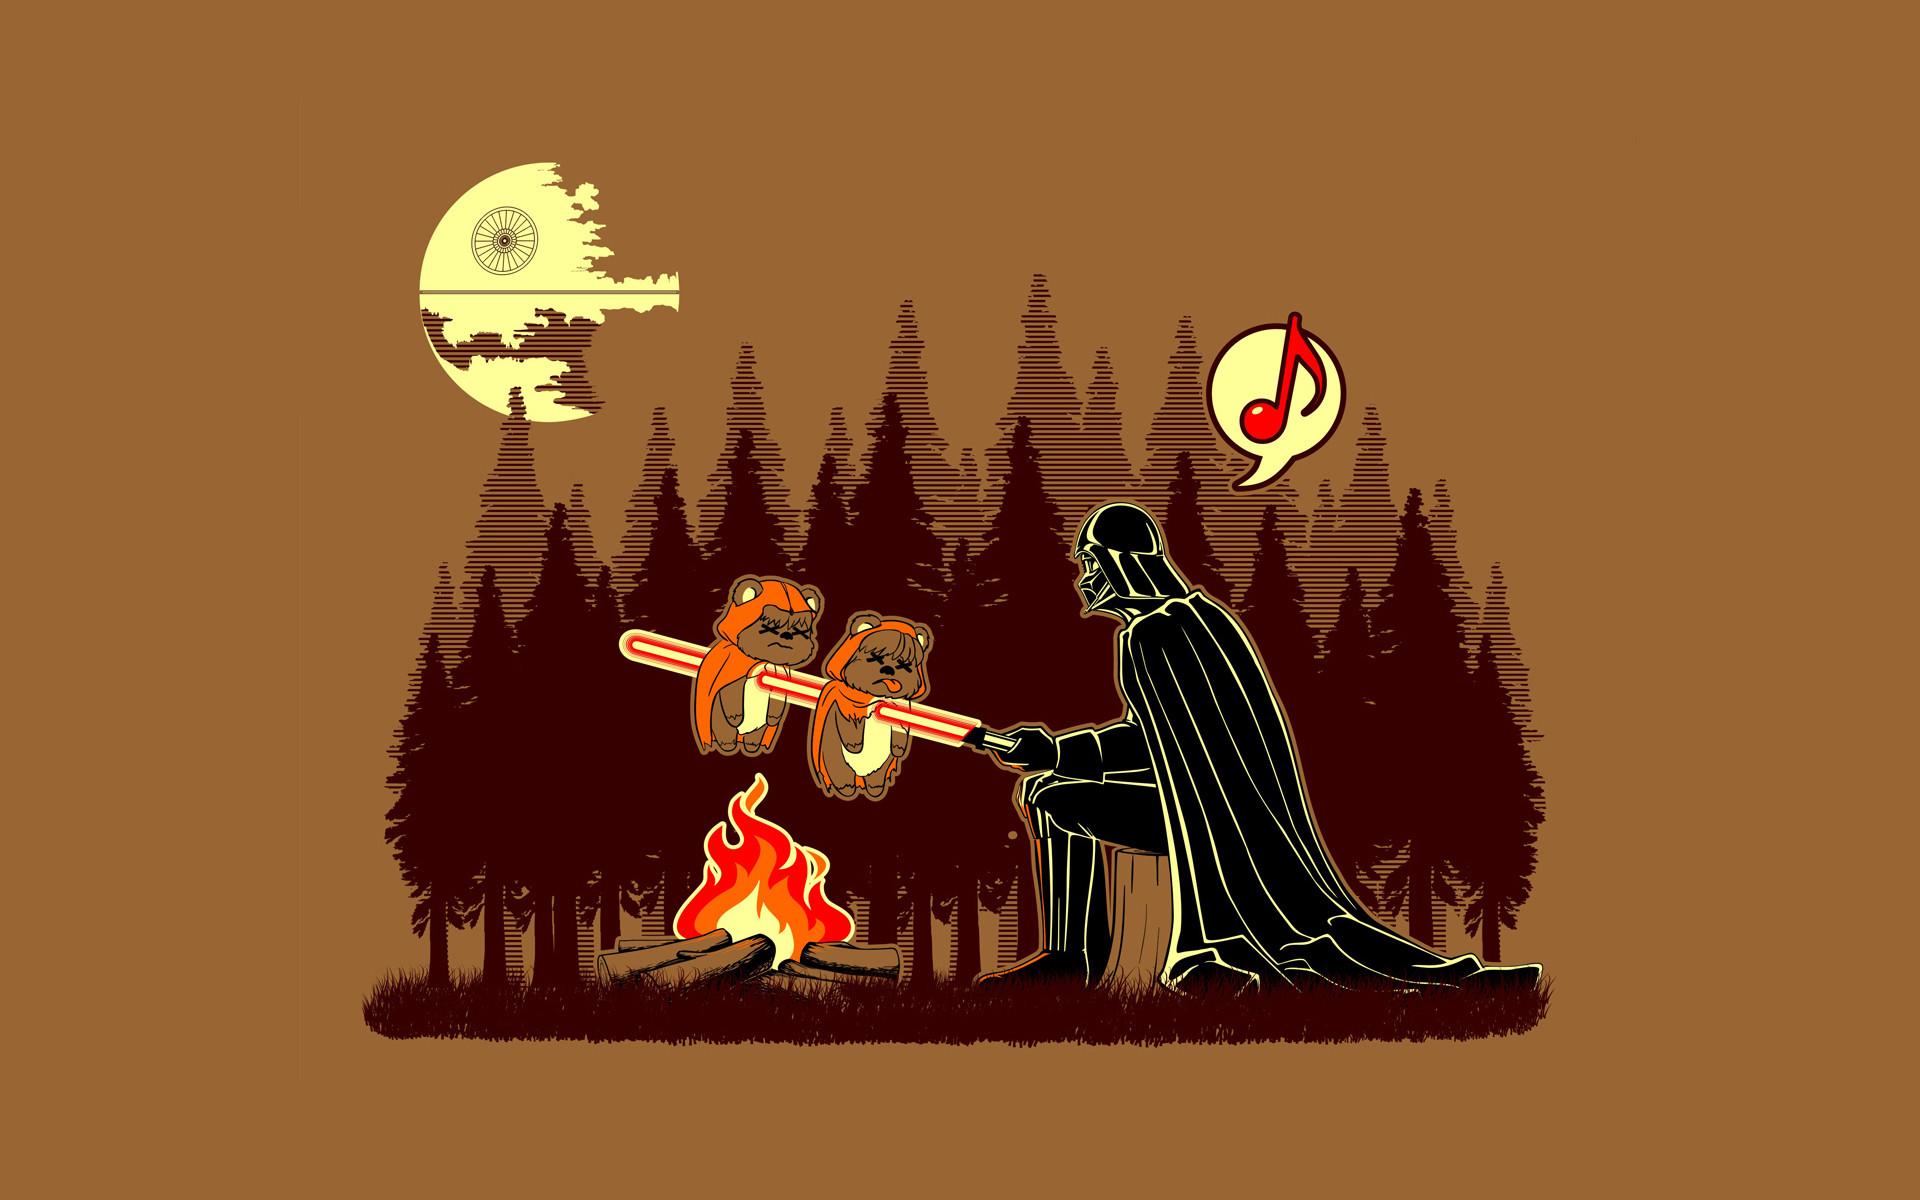 star-wars death star wars darth vader vader sadic humor funny lightsaber  sci-fi